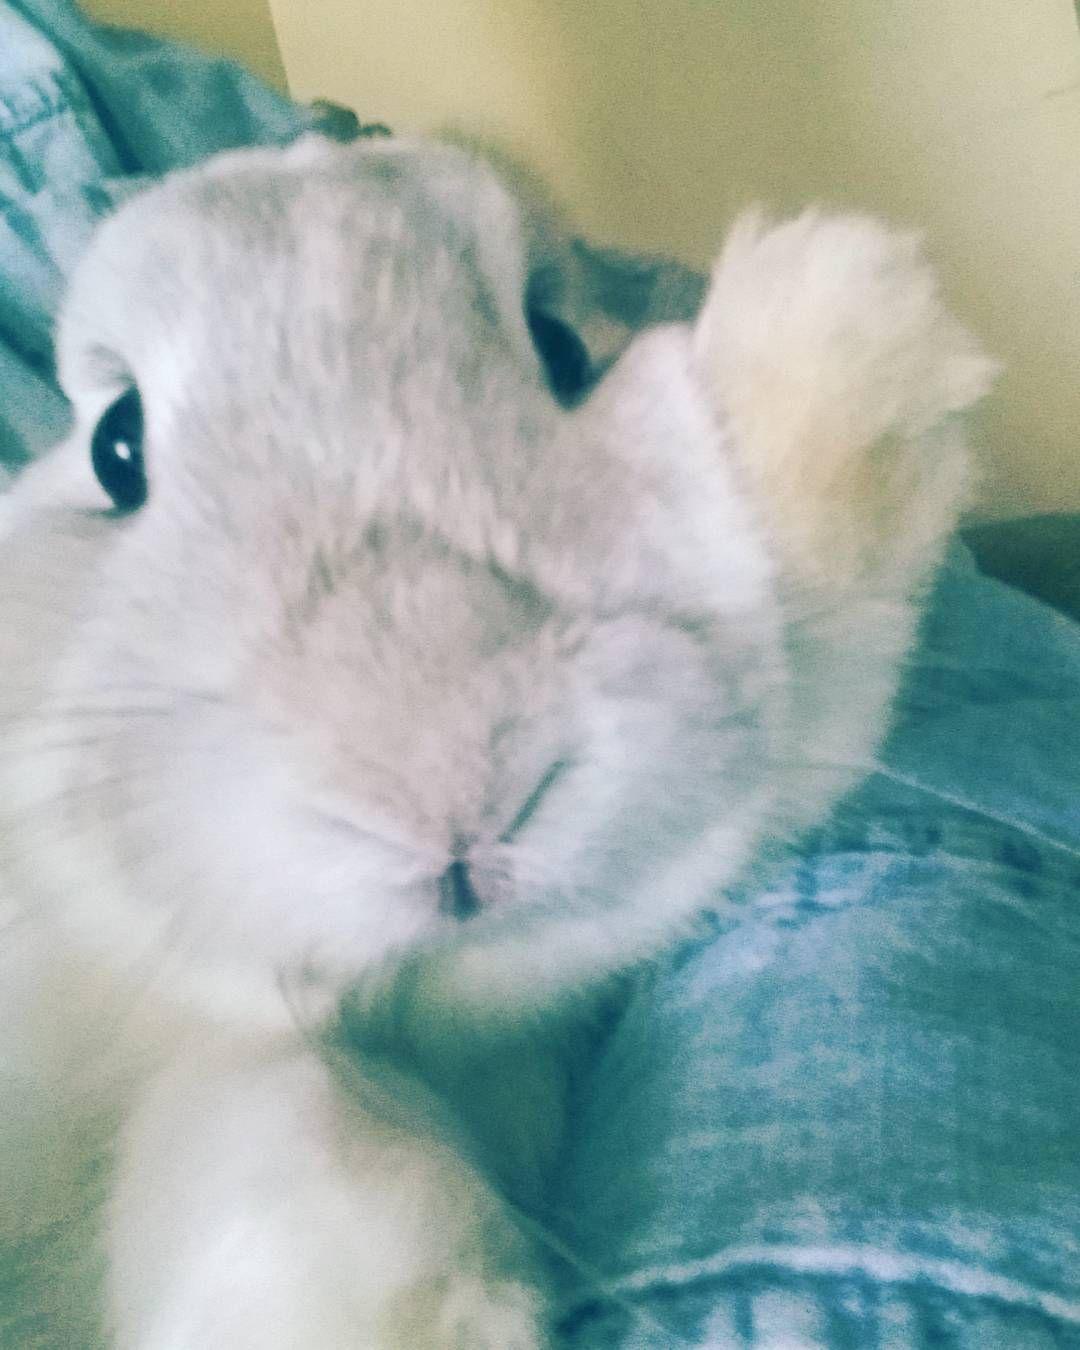 #rabbitsofinstagram #bunniesofinstagram #rabbitstagram #bunstagram #houserabbitsofinstagram #houserabbit #hollandlop #floppyearredbun #bigbaby #bunnylove #rabbitmom #sugar #sugeknight #rabbits #bunny #bunnystagram  by lovelee_28